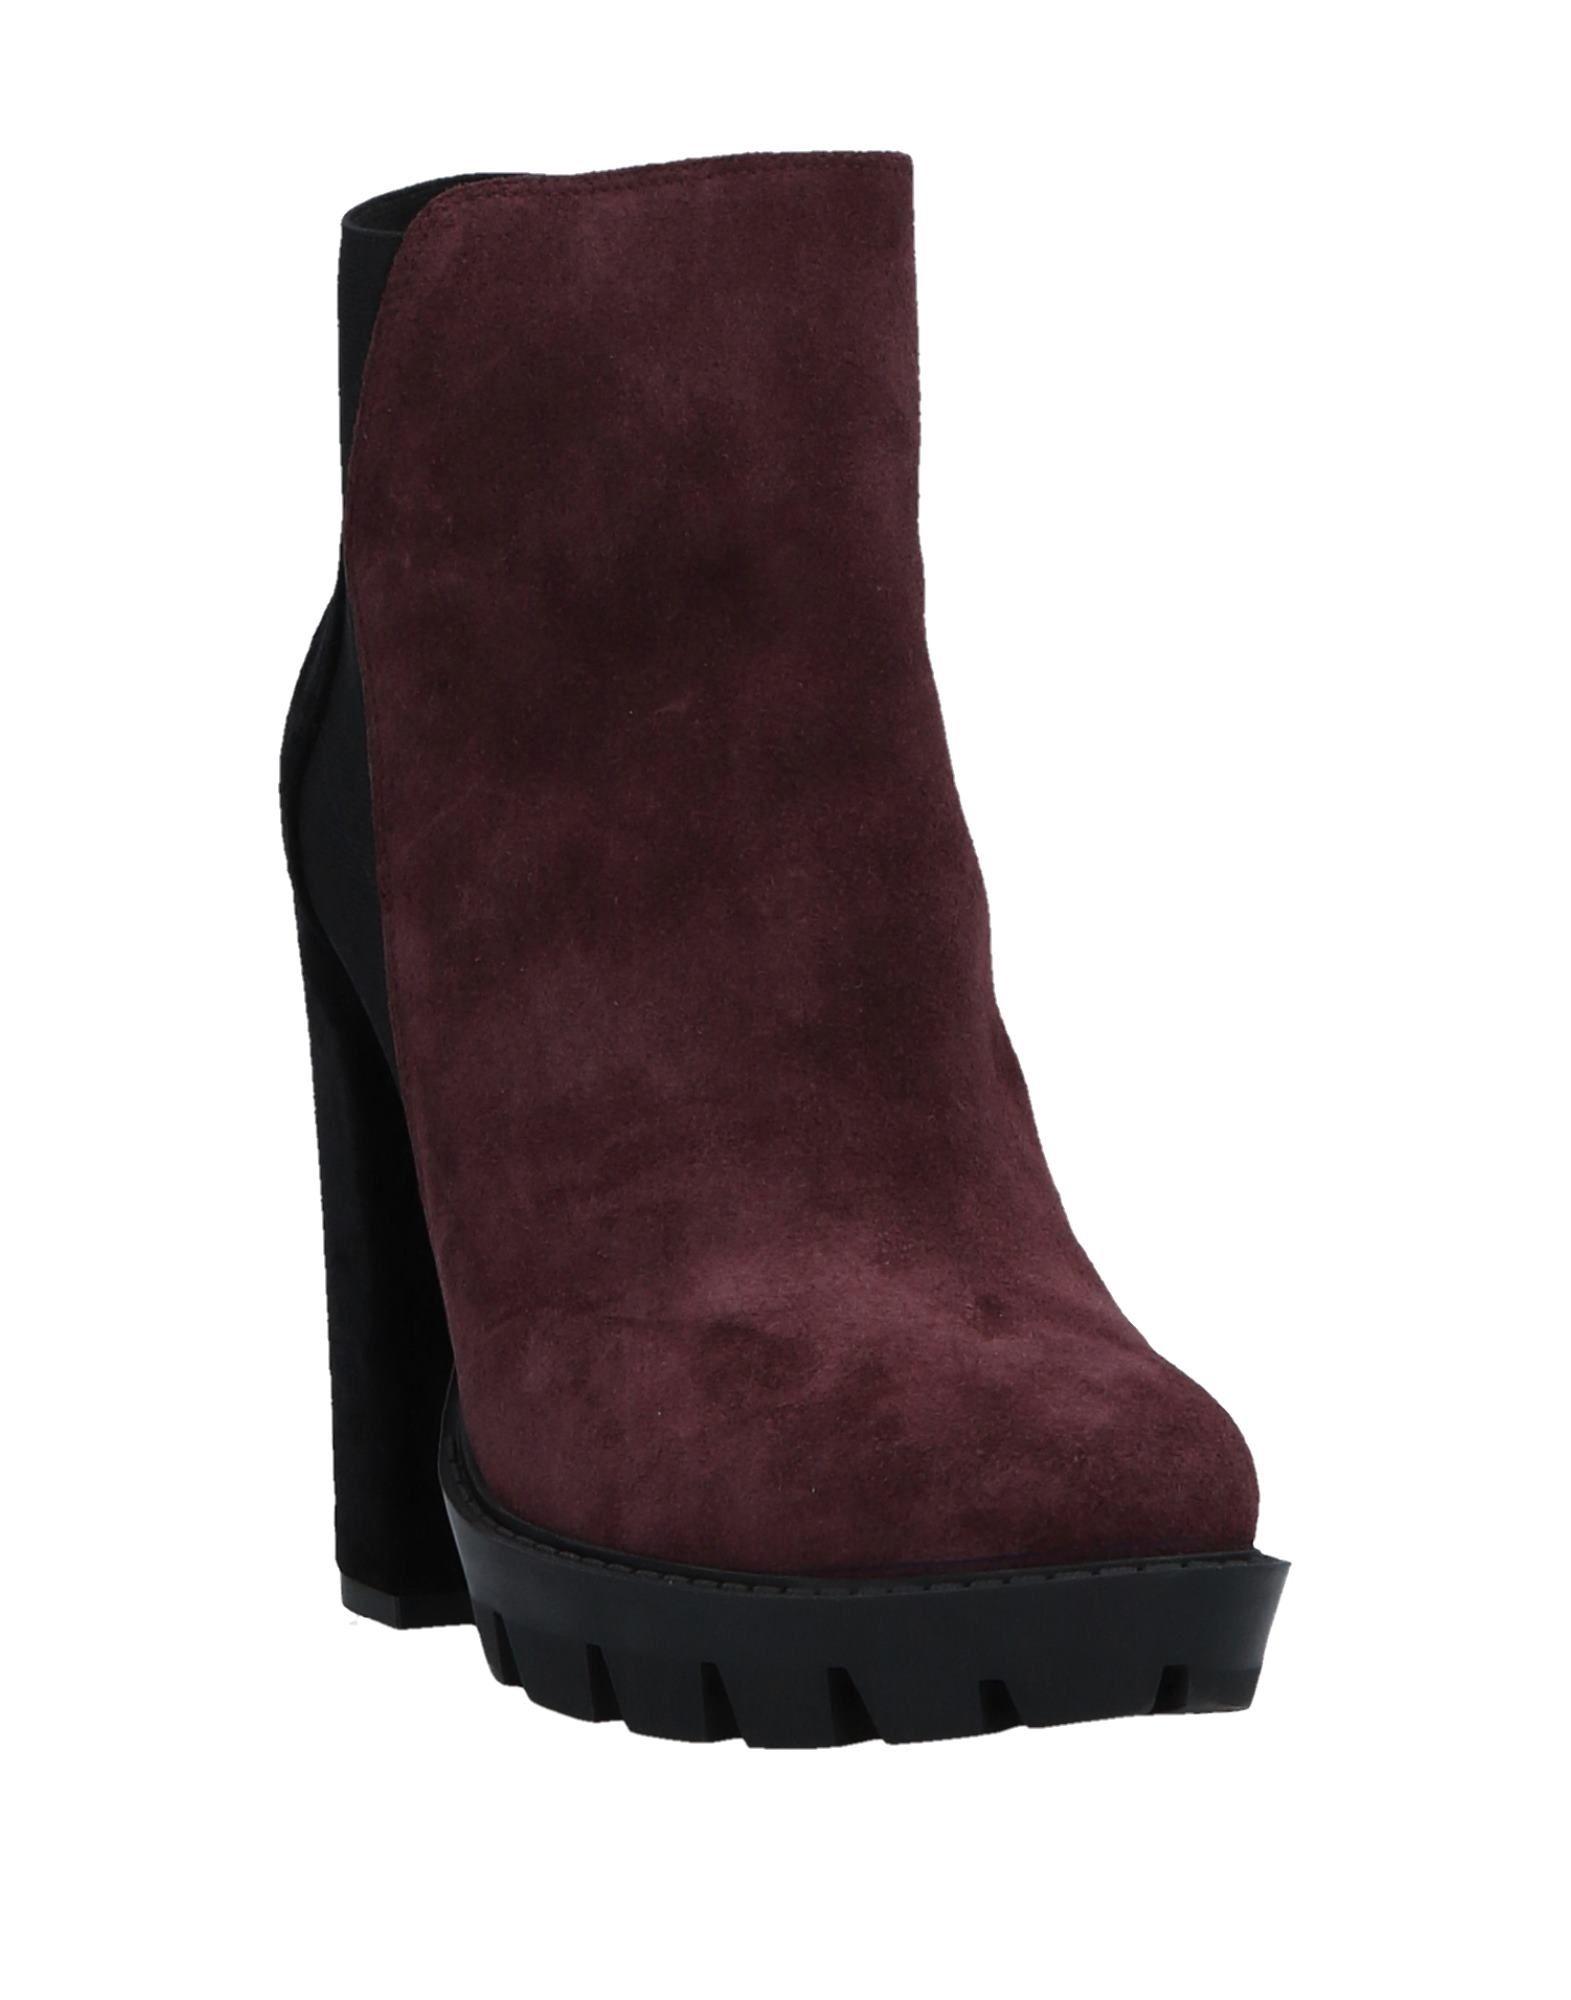 Stilvolle billige Schuhe 11518254QW Pollini Stiefelette Damen  11518254QW Schuhe 534cb9